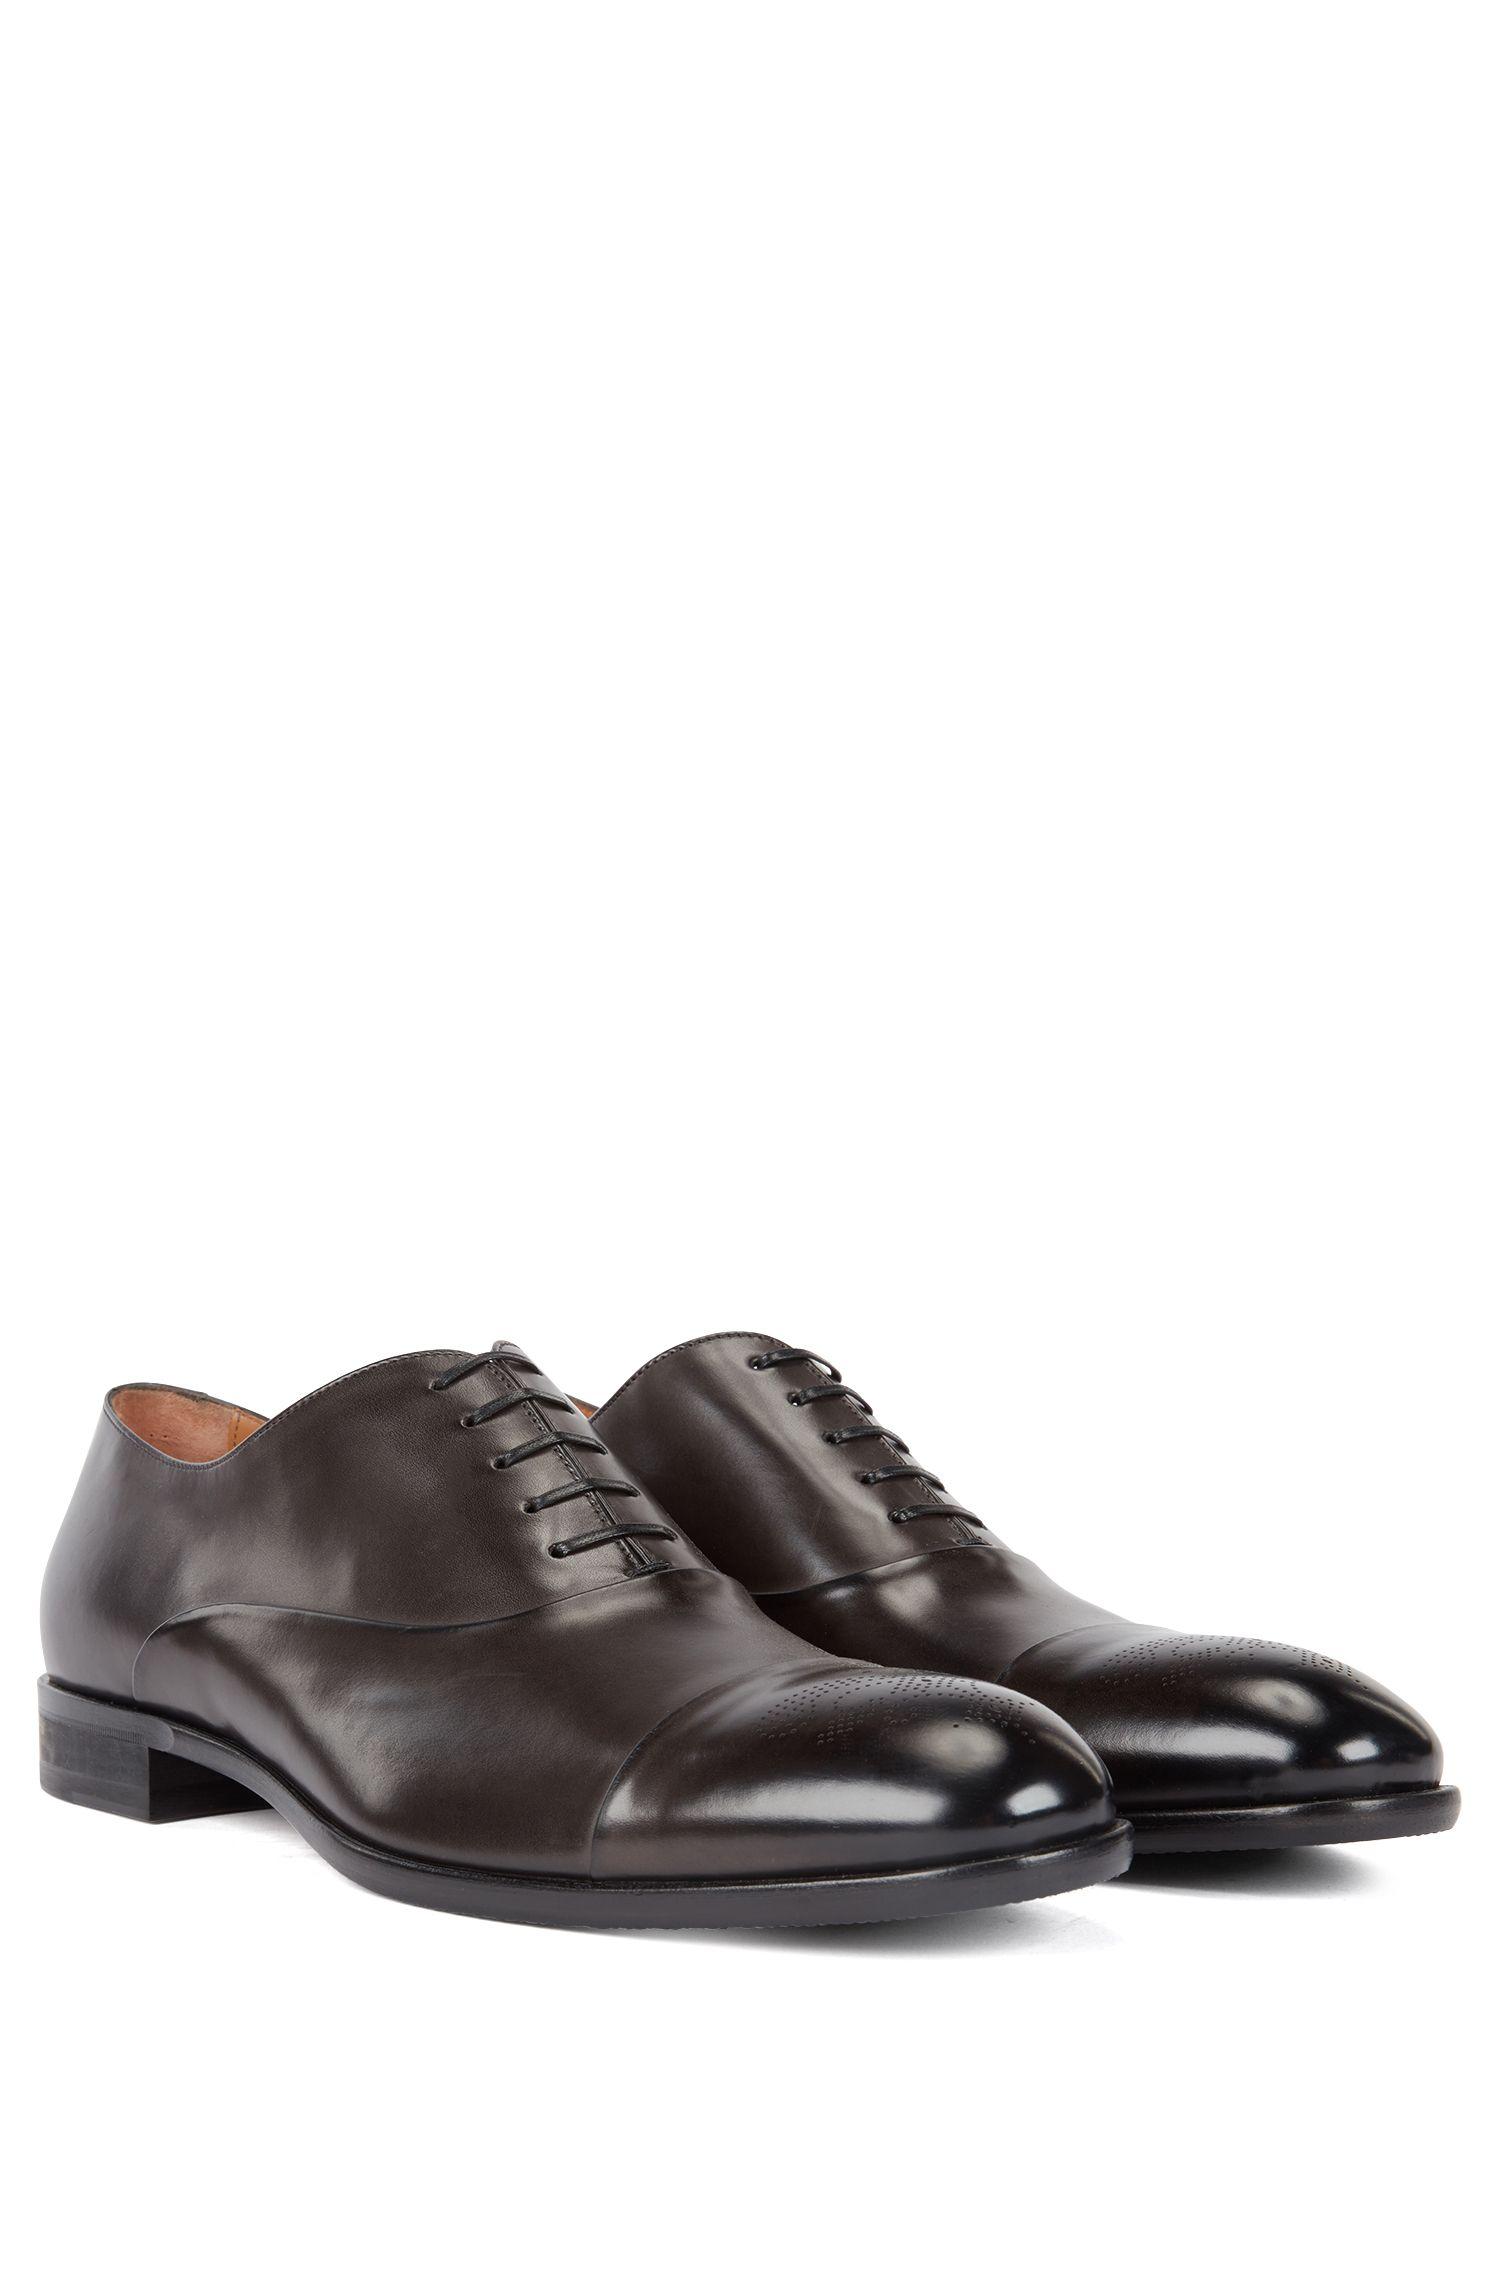 Oxford-Schuhe aus poliertem Leder mit gelasertem Budapester Muster, Dunkelgrau